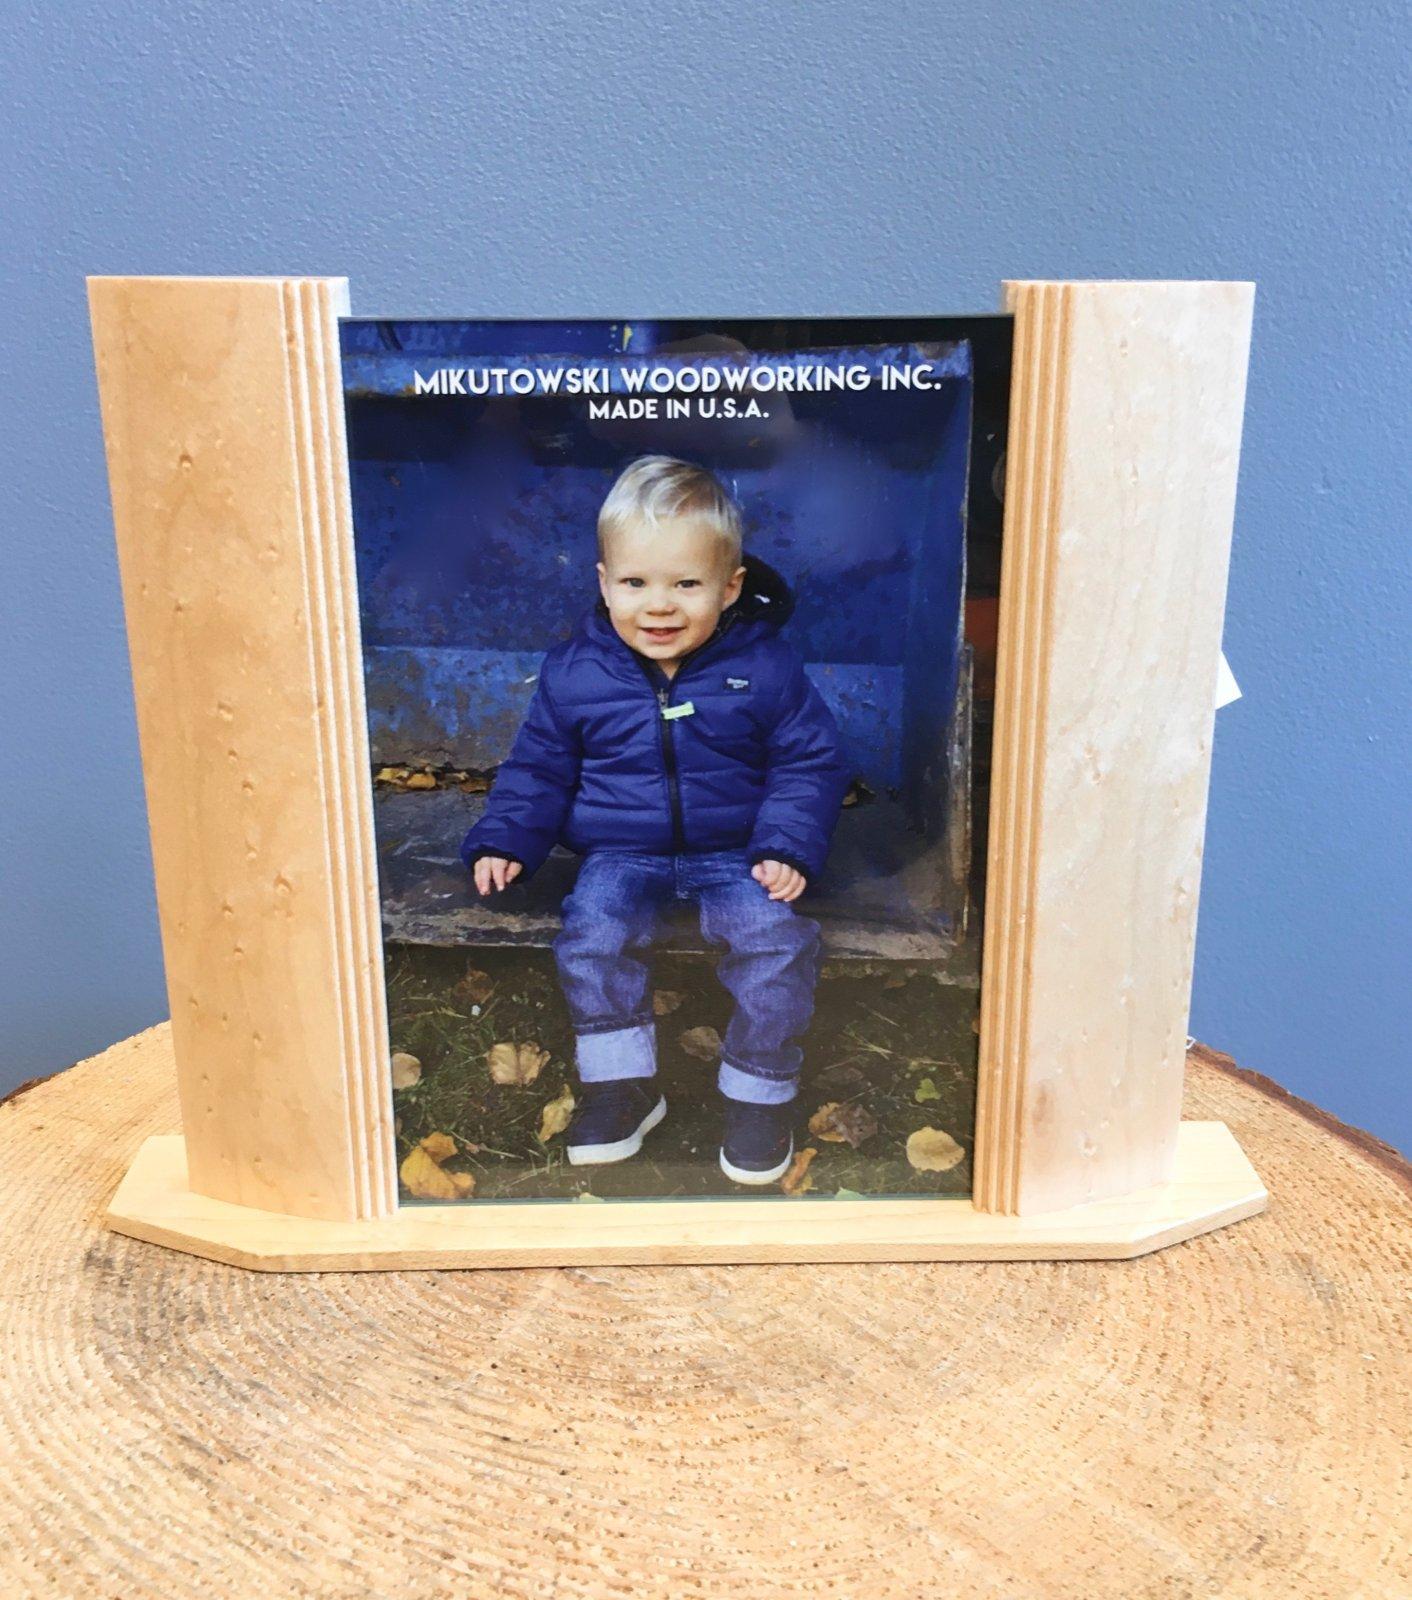 Mikutowski 5x7 Wood Frame - Birdseye Maple